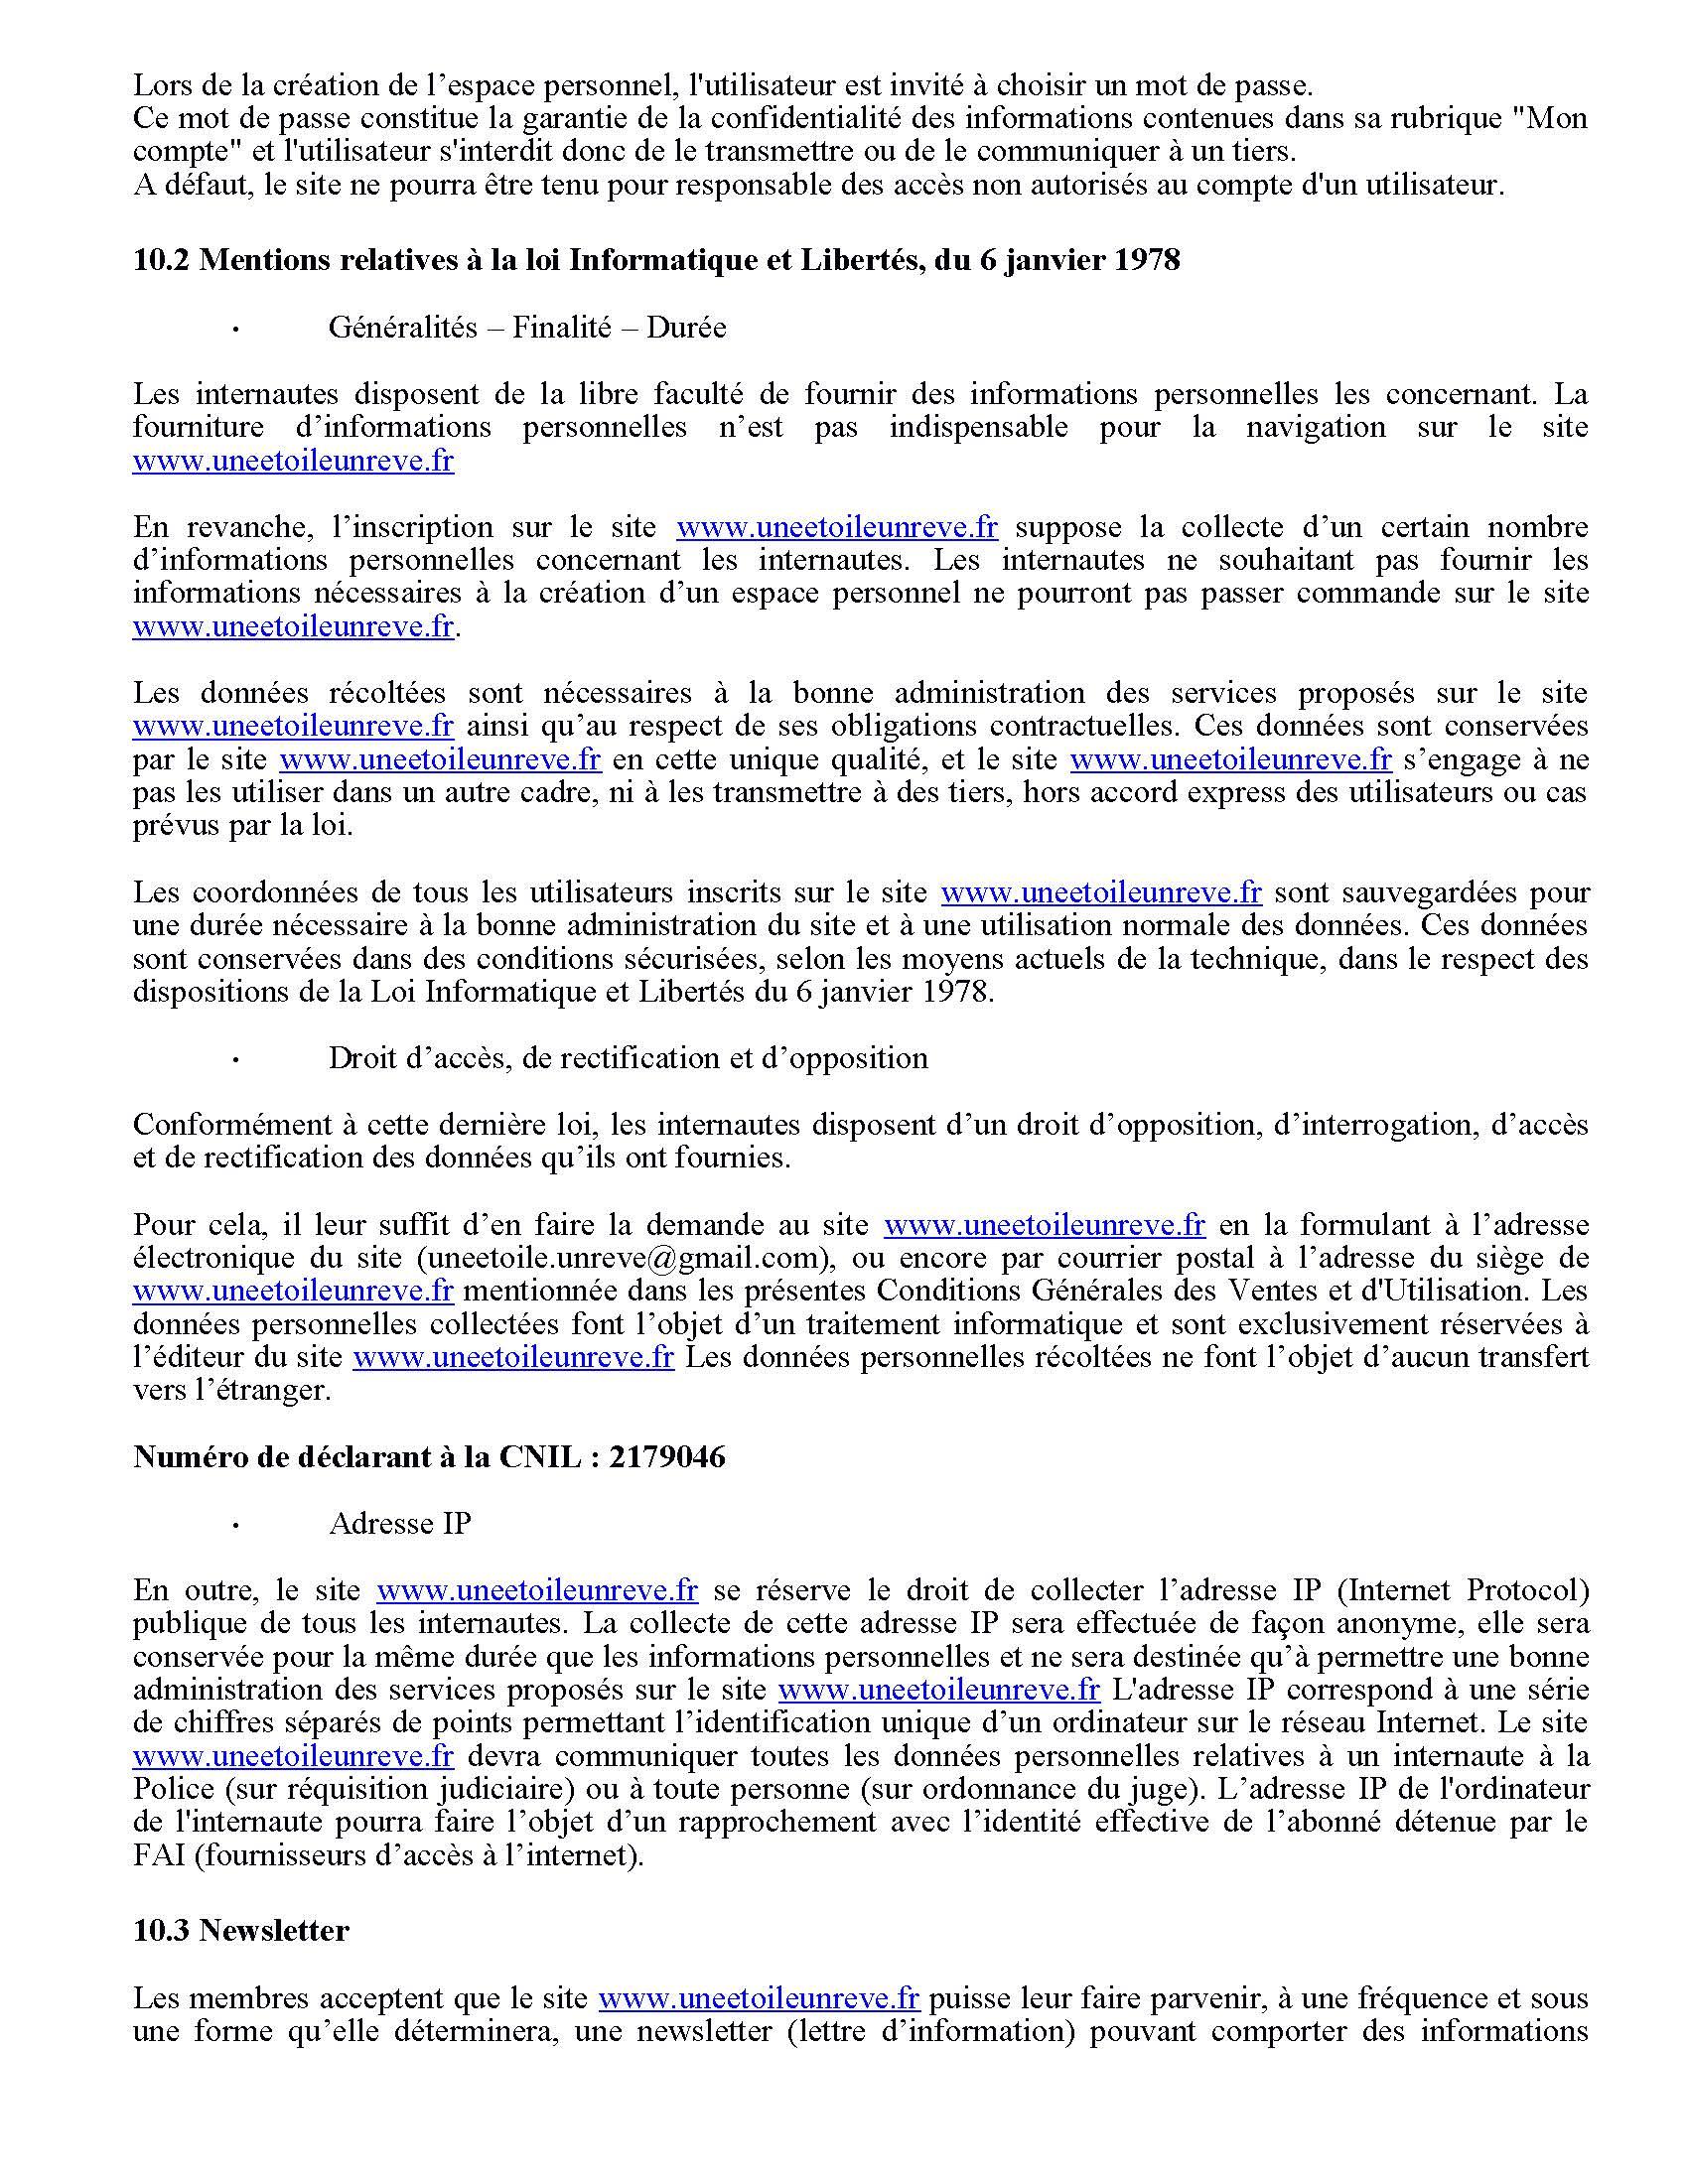 CGV_www.uneetoileunreve.fr_Page_12.jpg